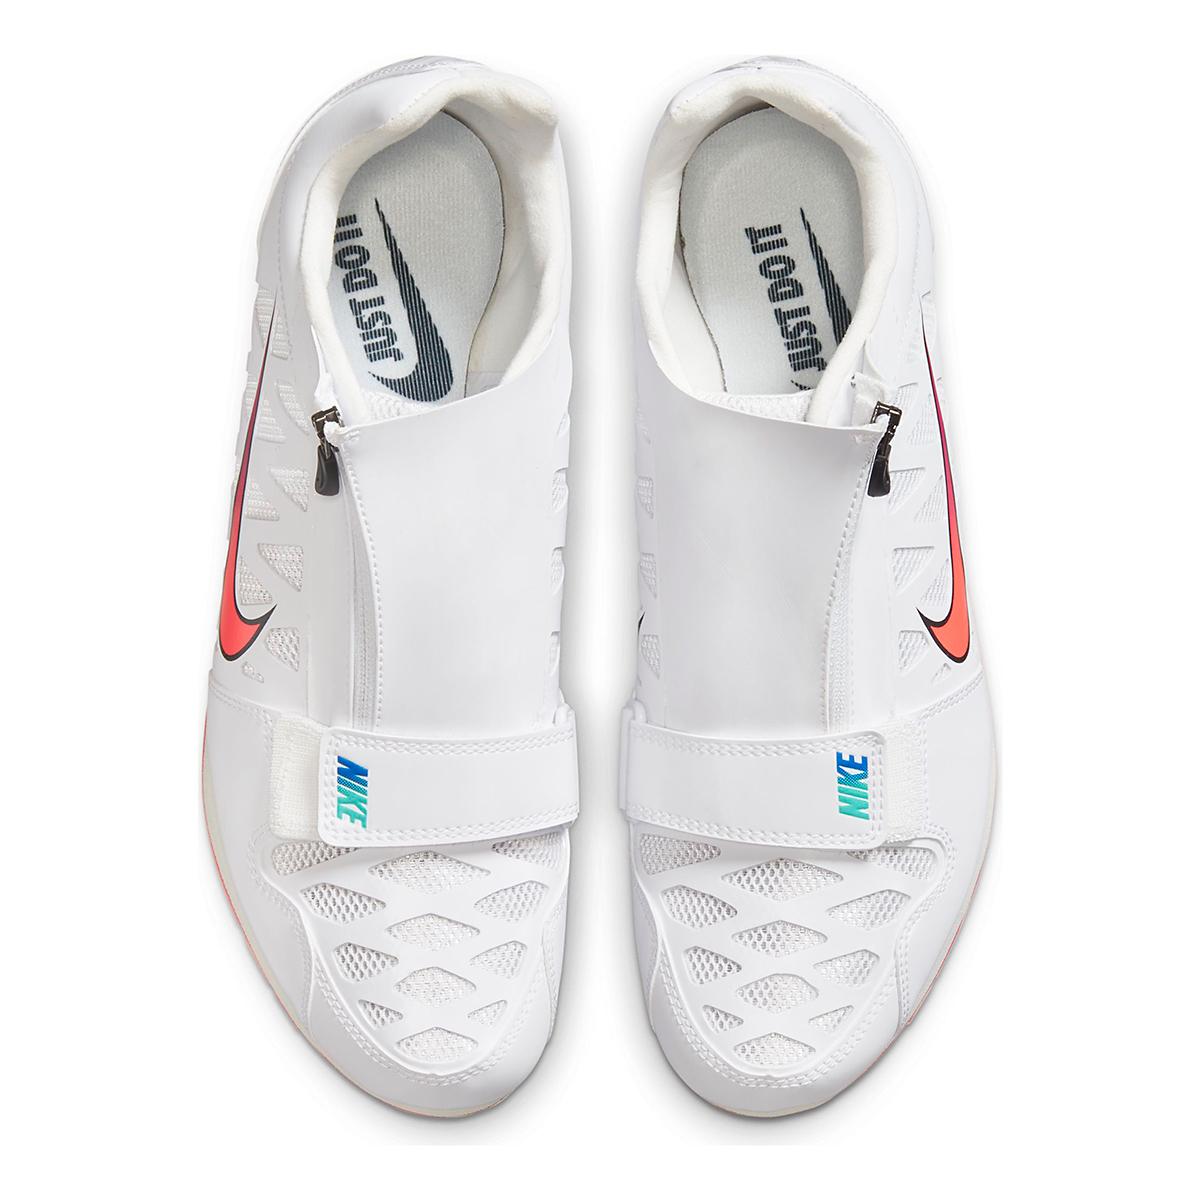 Nike Zoom Long Jump 4 Track Spikes - Color: White/Flash Crimson - Size: M4/W5.5 - Width: Regular, White/Flash Crimson, large, image 6